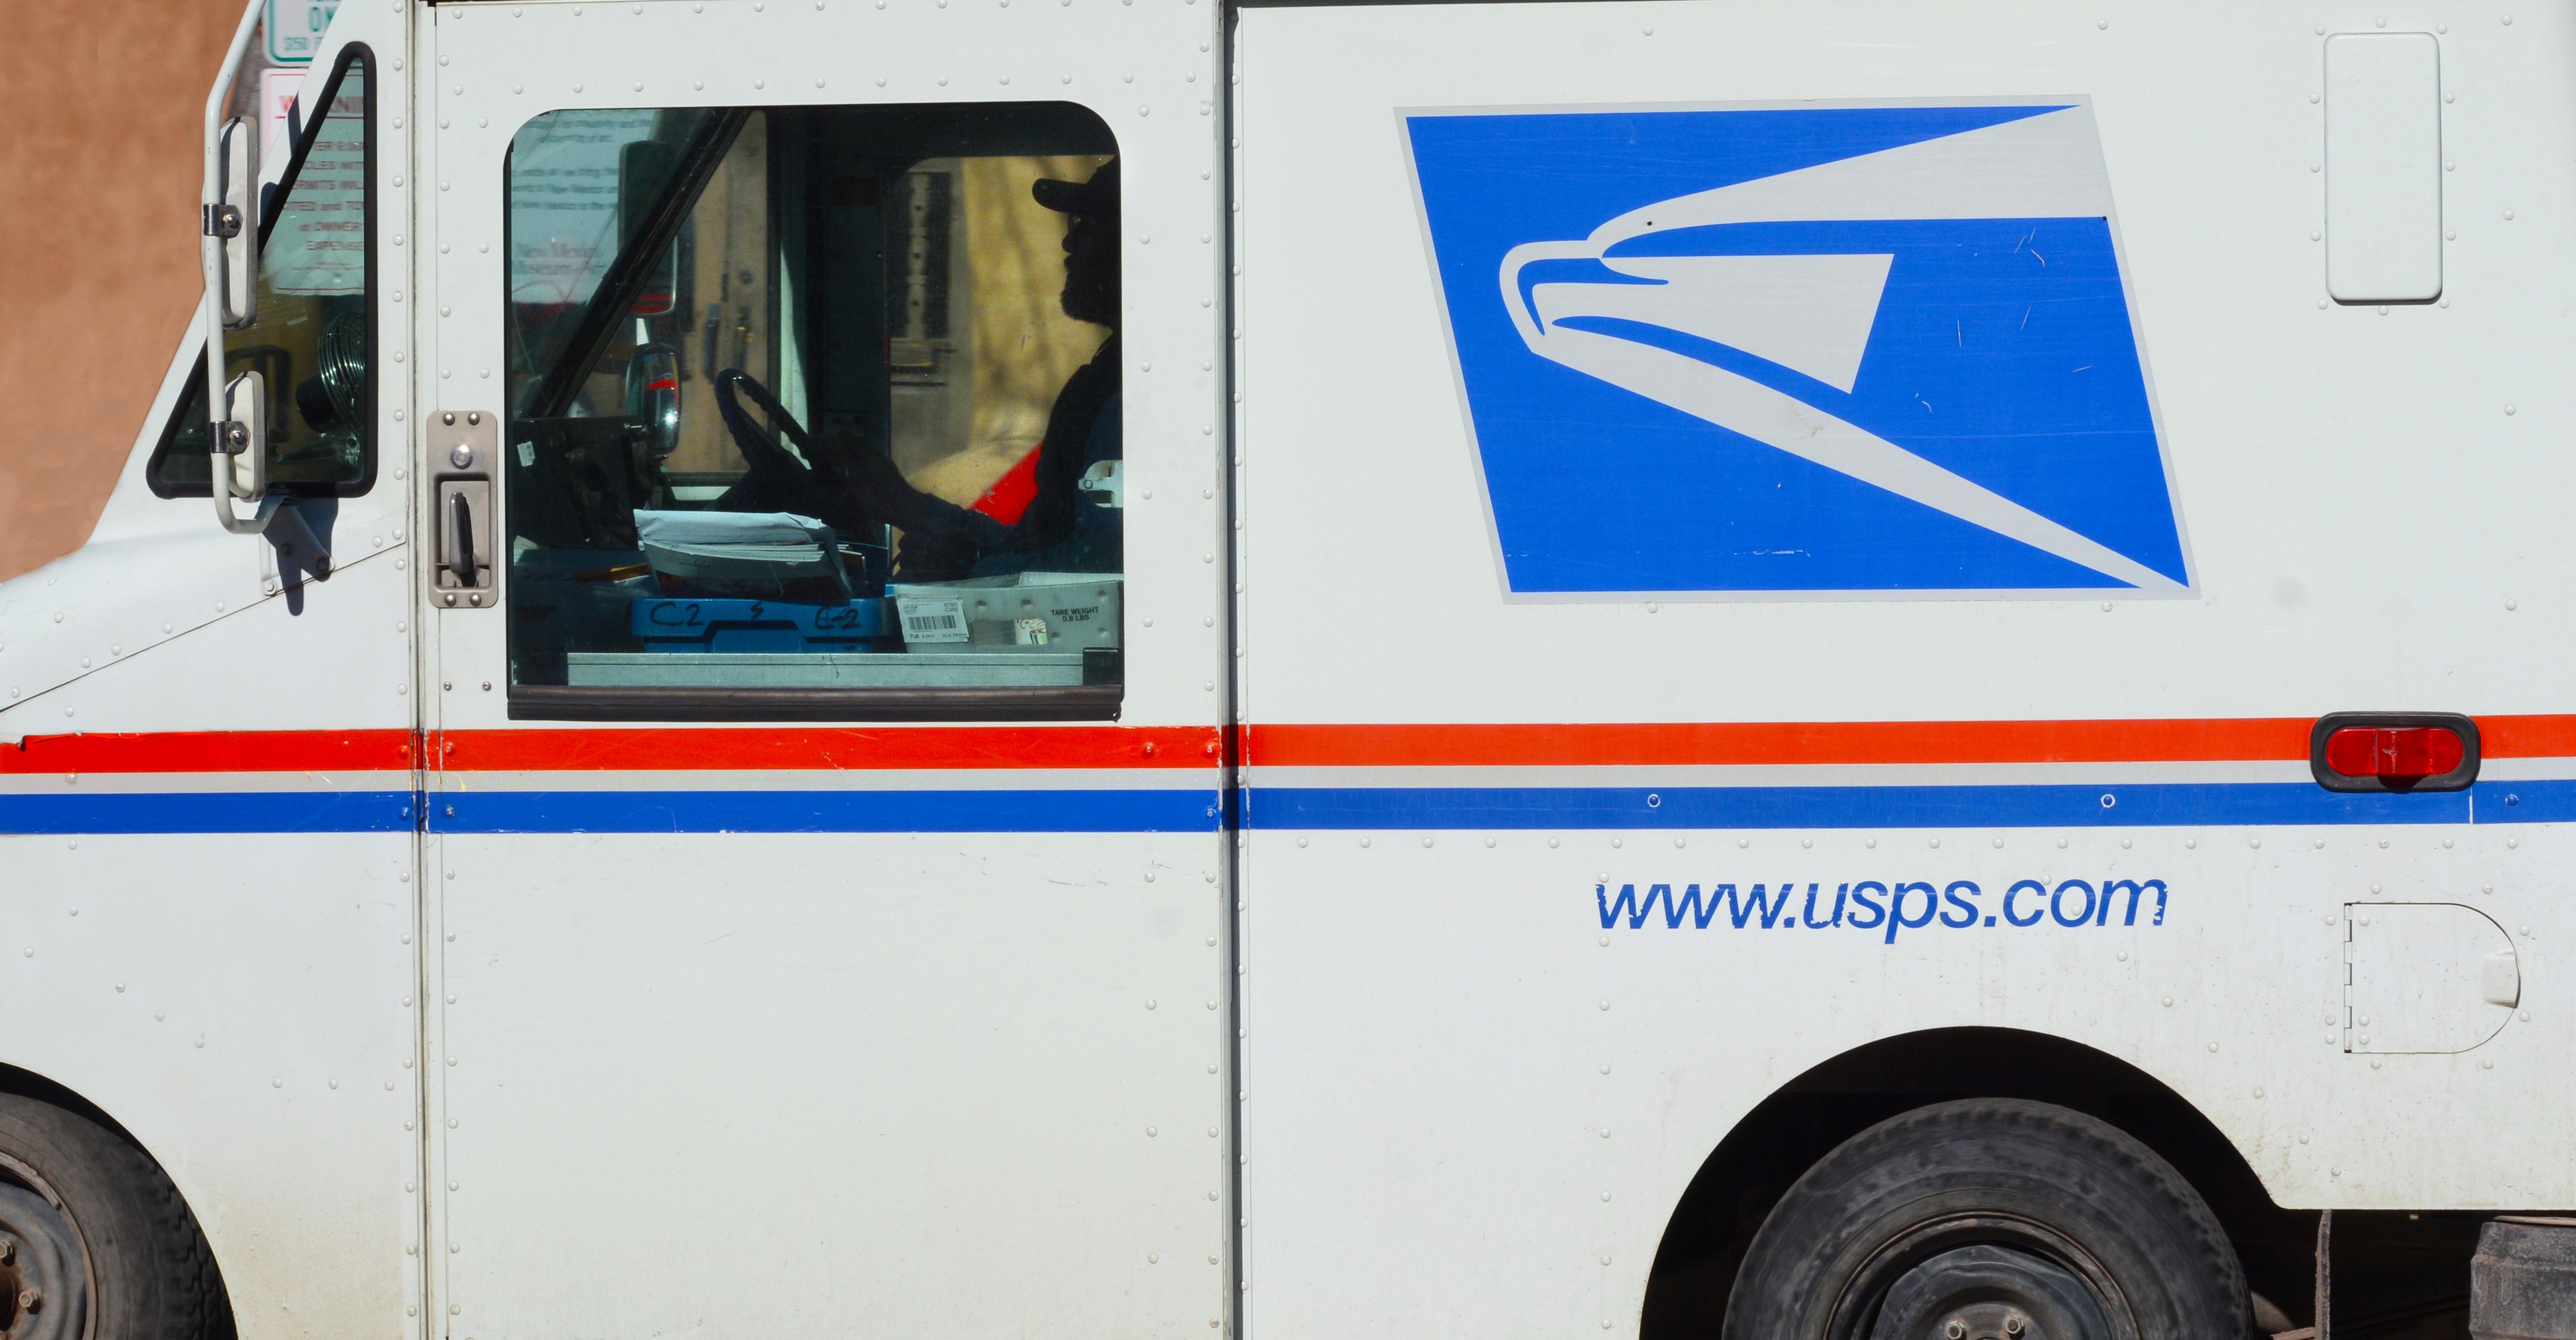 US postman at work